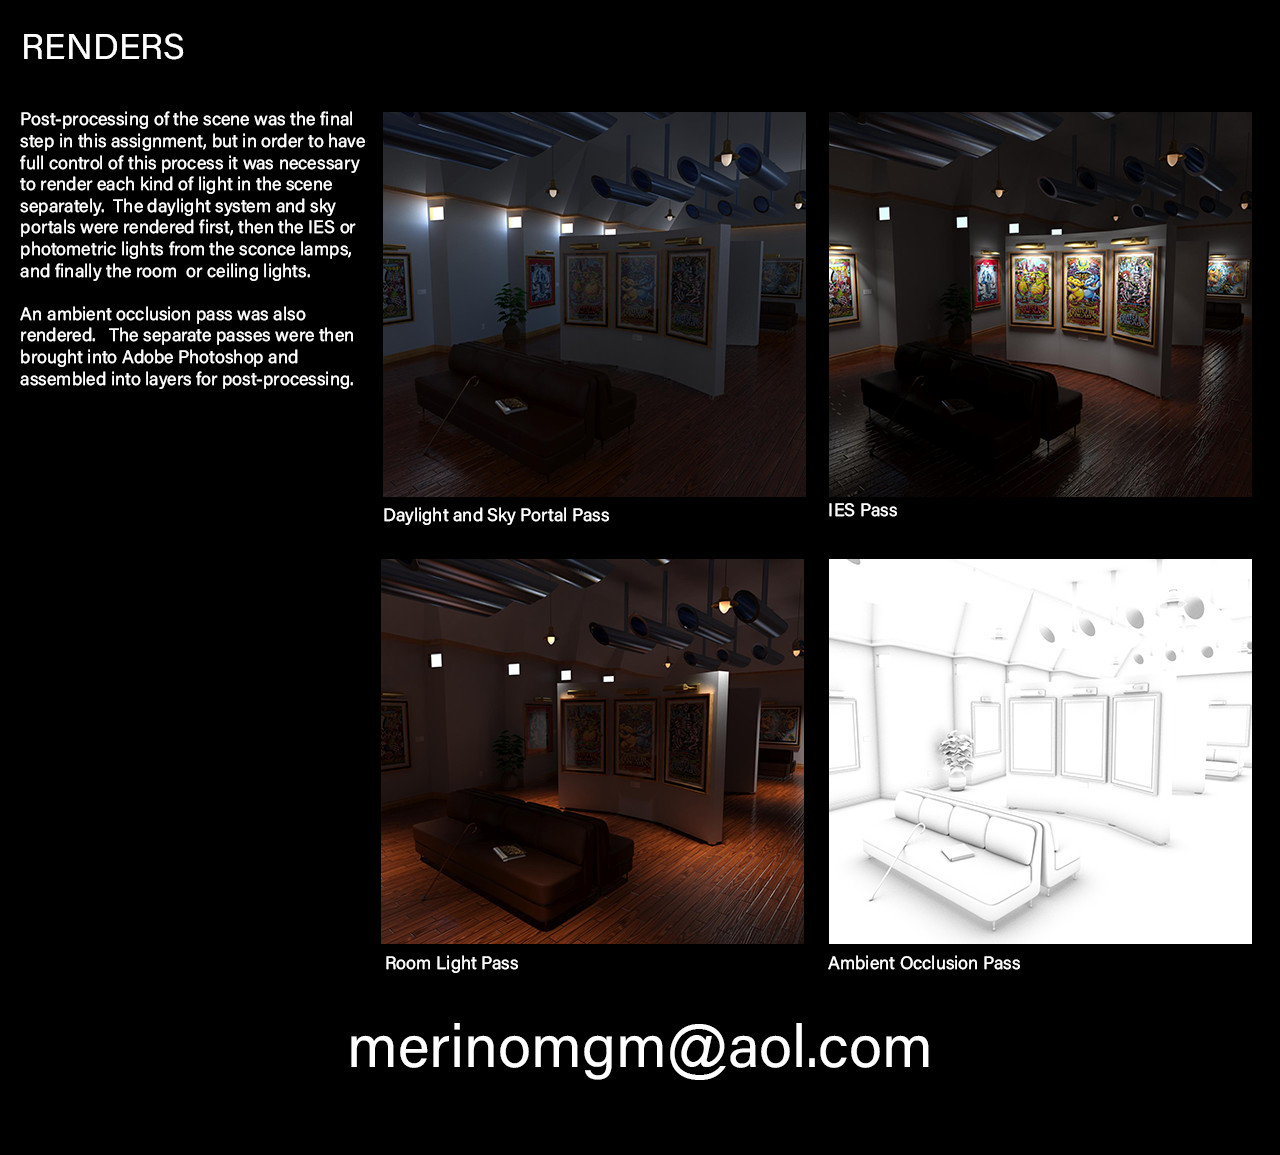 Mario merino museum render passes